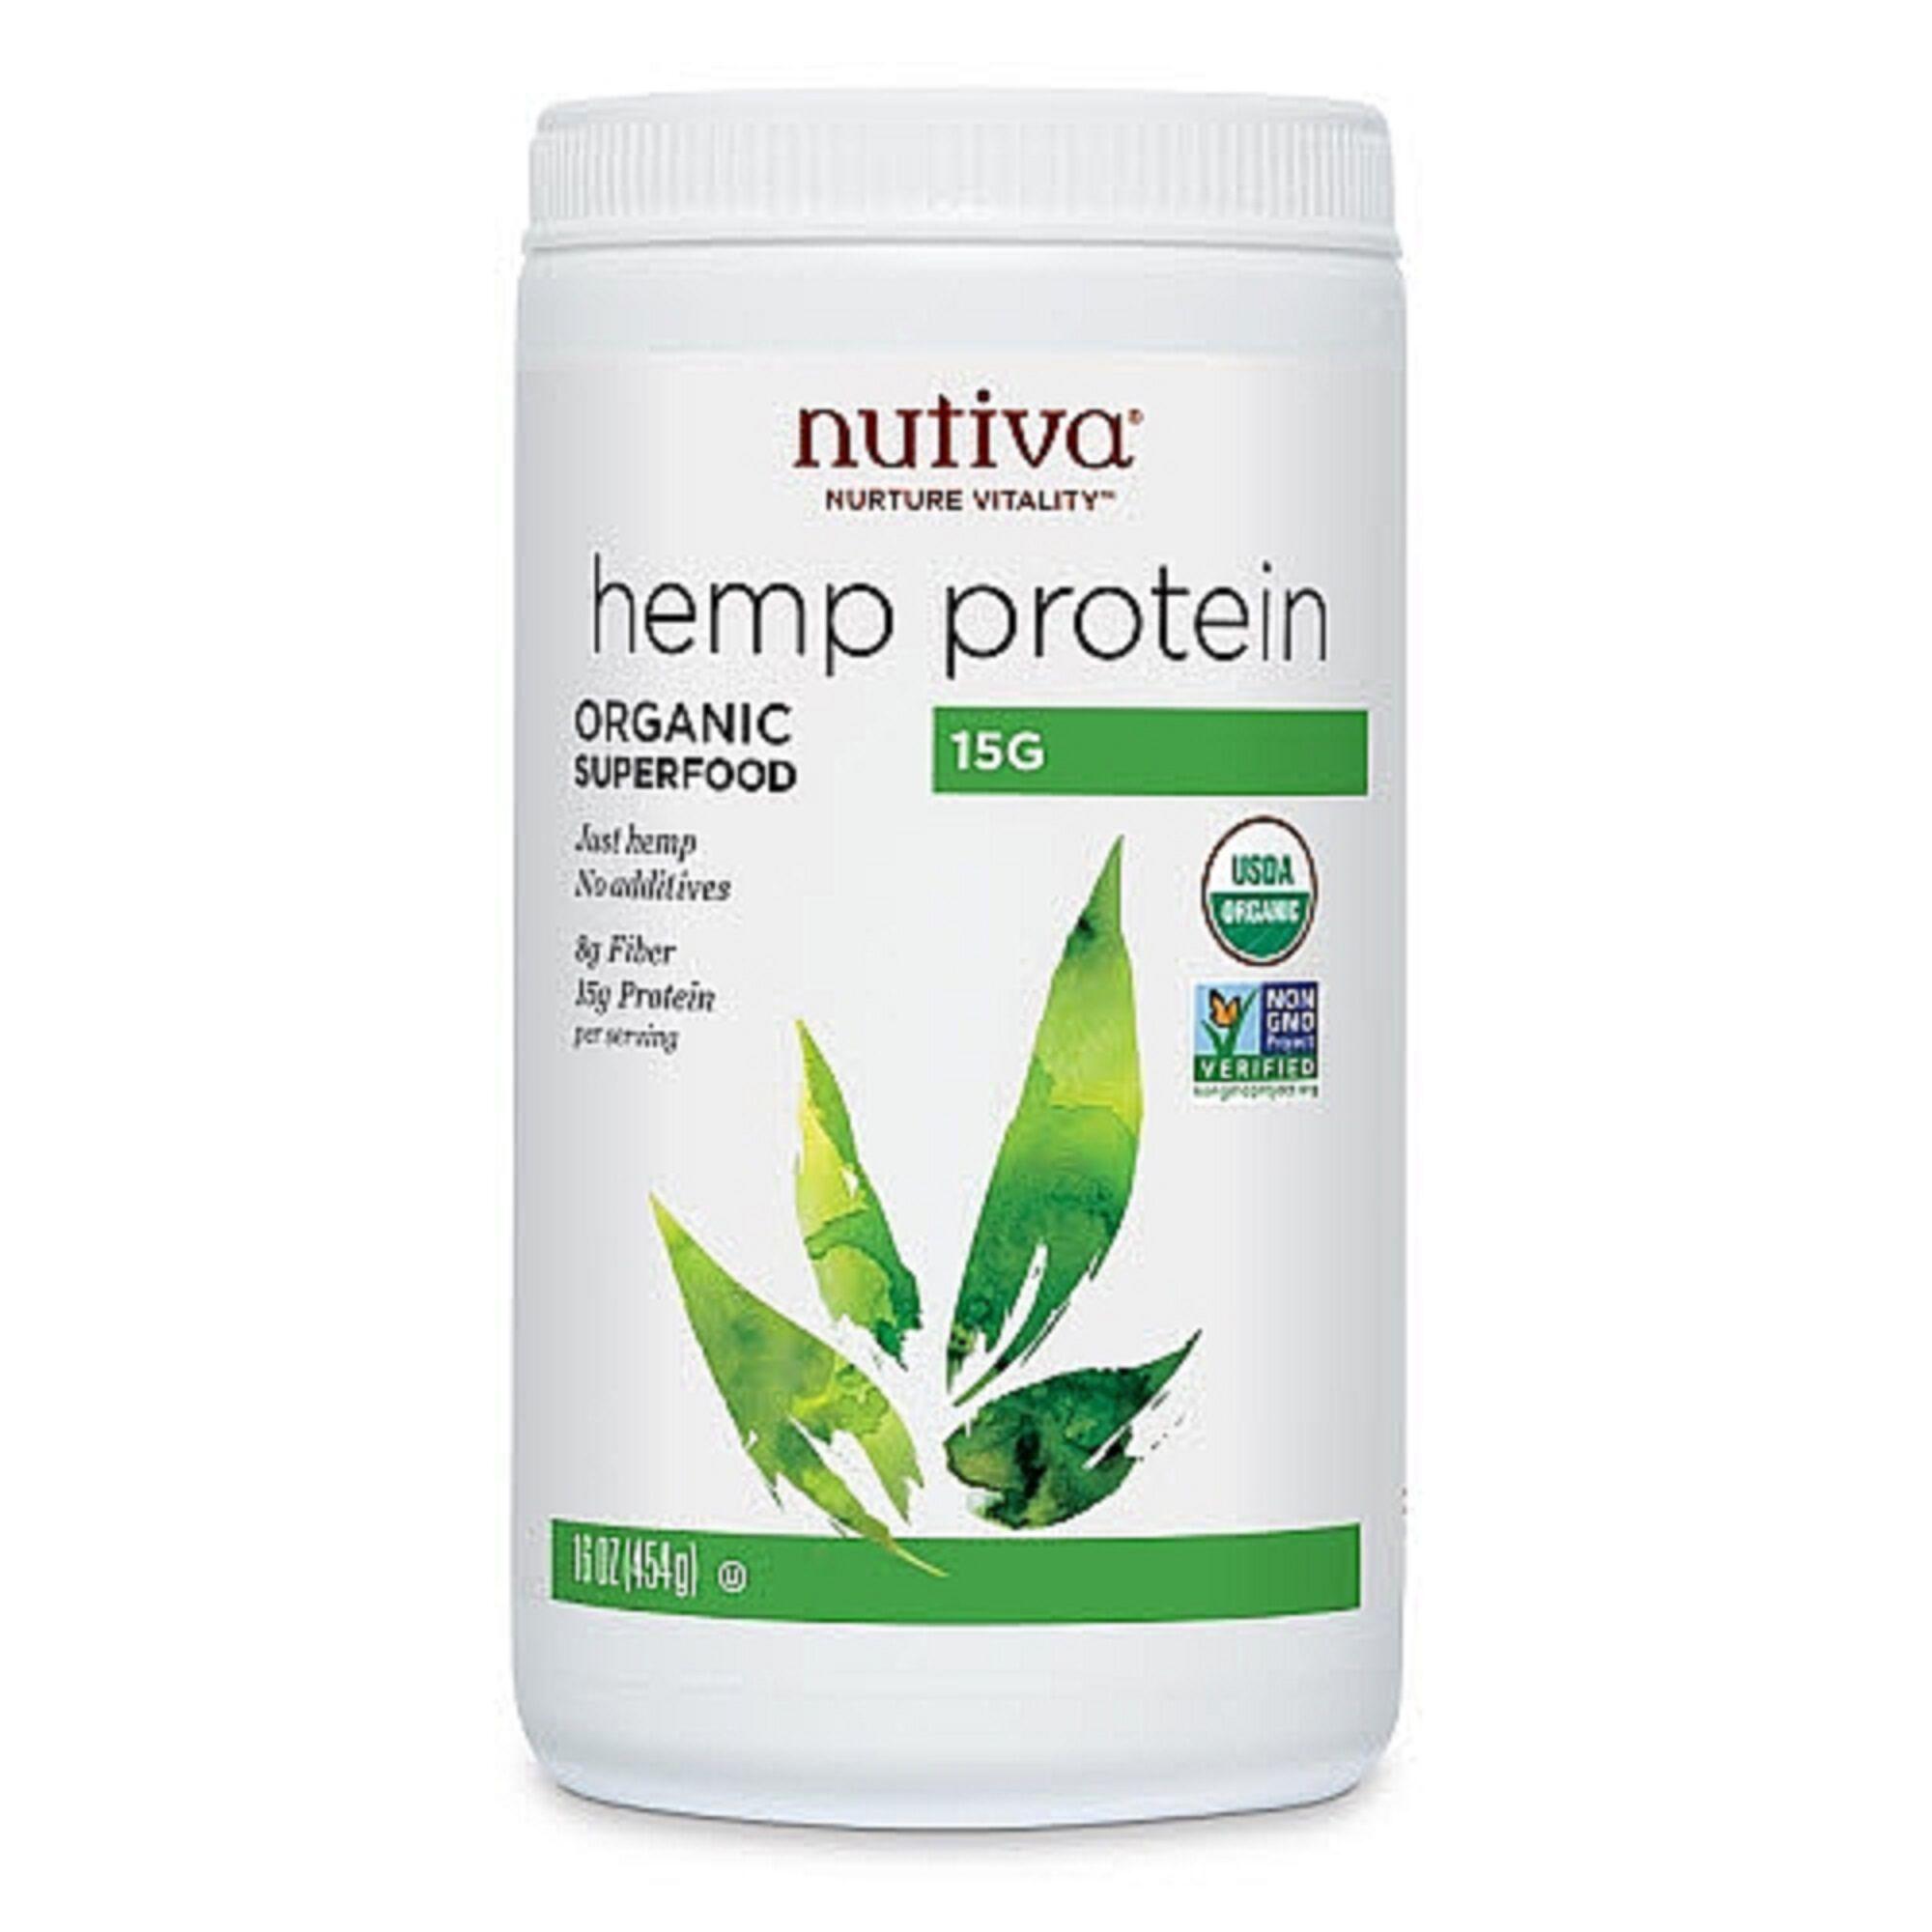 Nutiva® Hemp Protein 15G